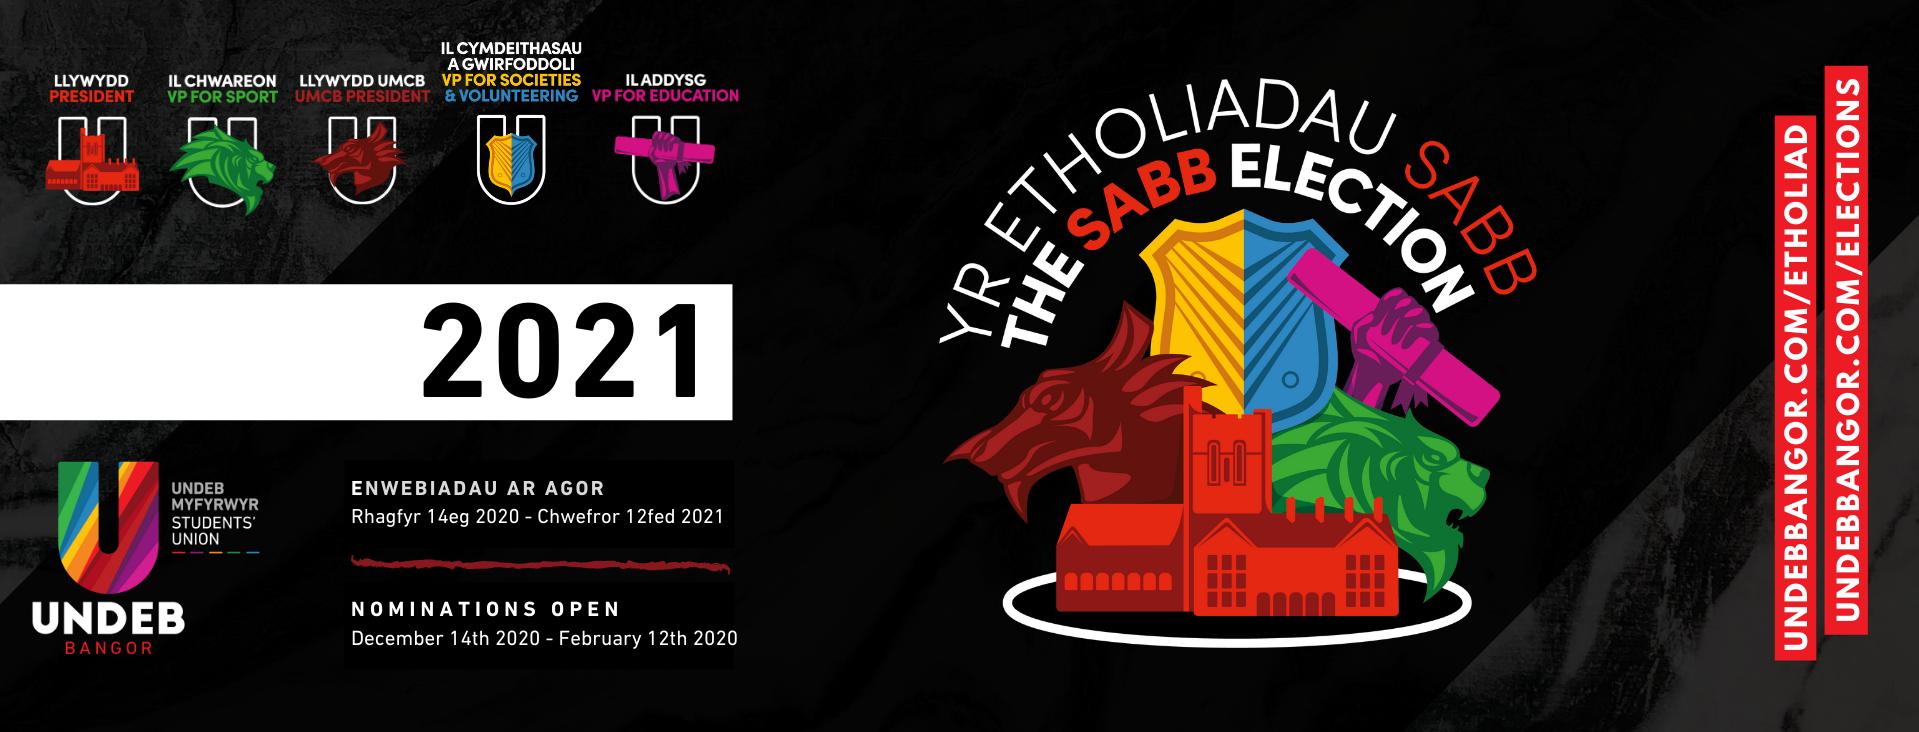 Sabb election web banner 2021